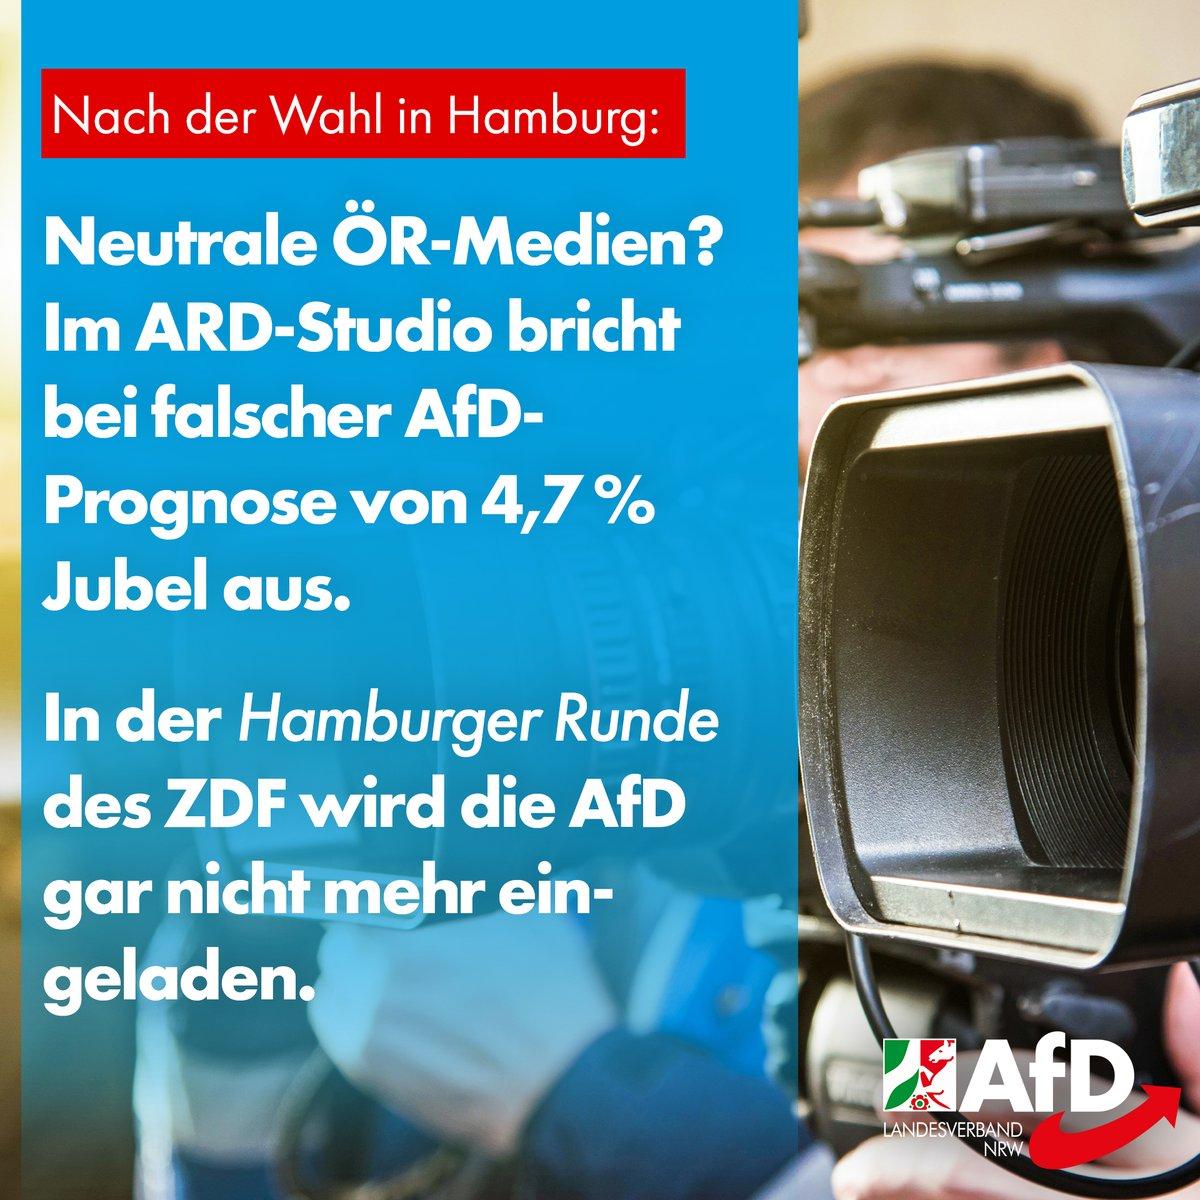 #hamburgwahl2020